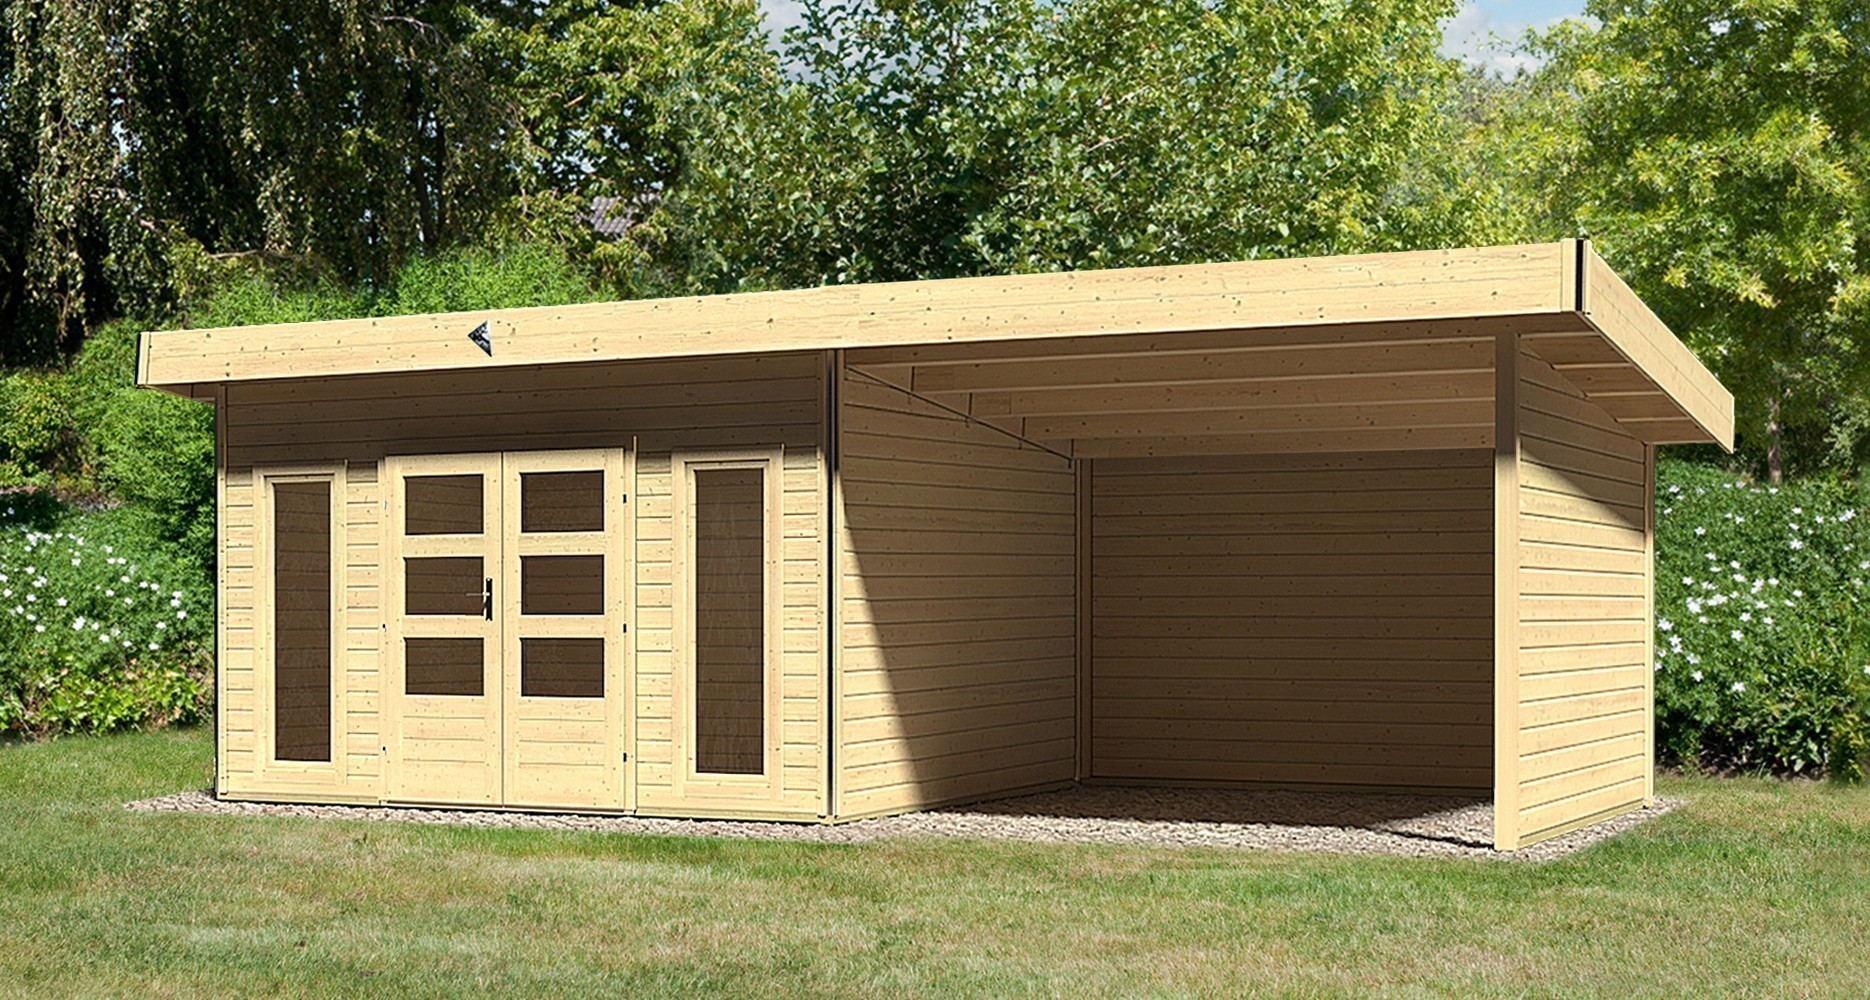 karibu gartenhaus 40mm tecklenburg 1 natur set anbaudach 300cm wand bei. Black Bedroom Furniture Sets. Home Design Ideas